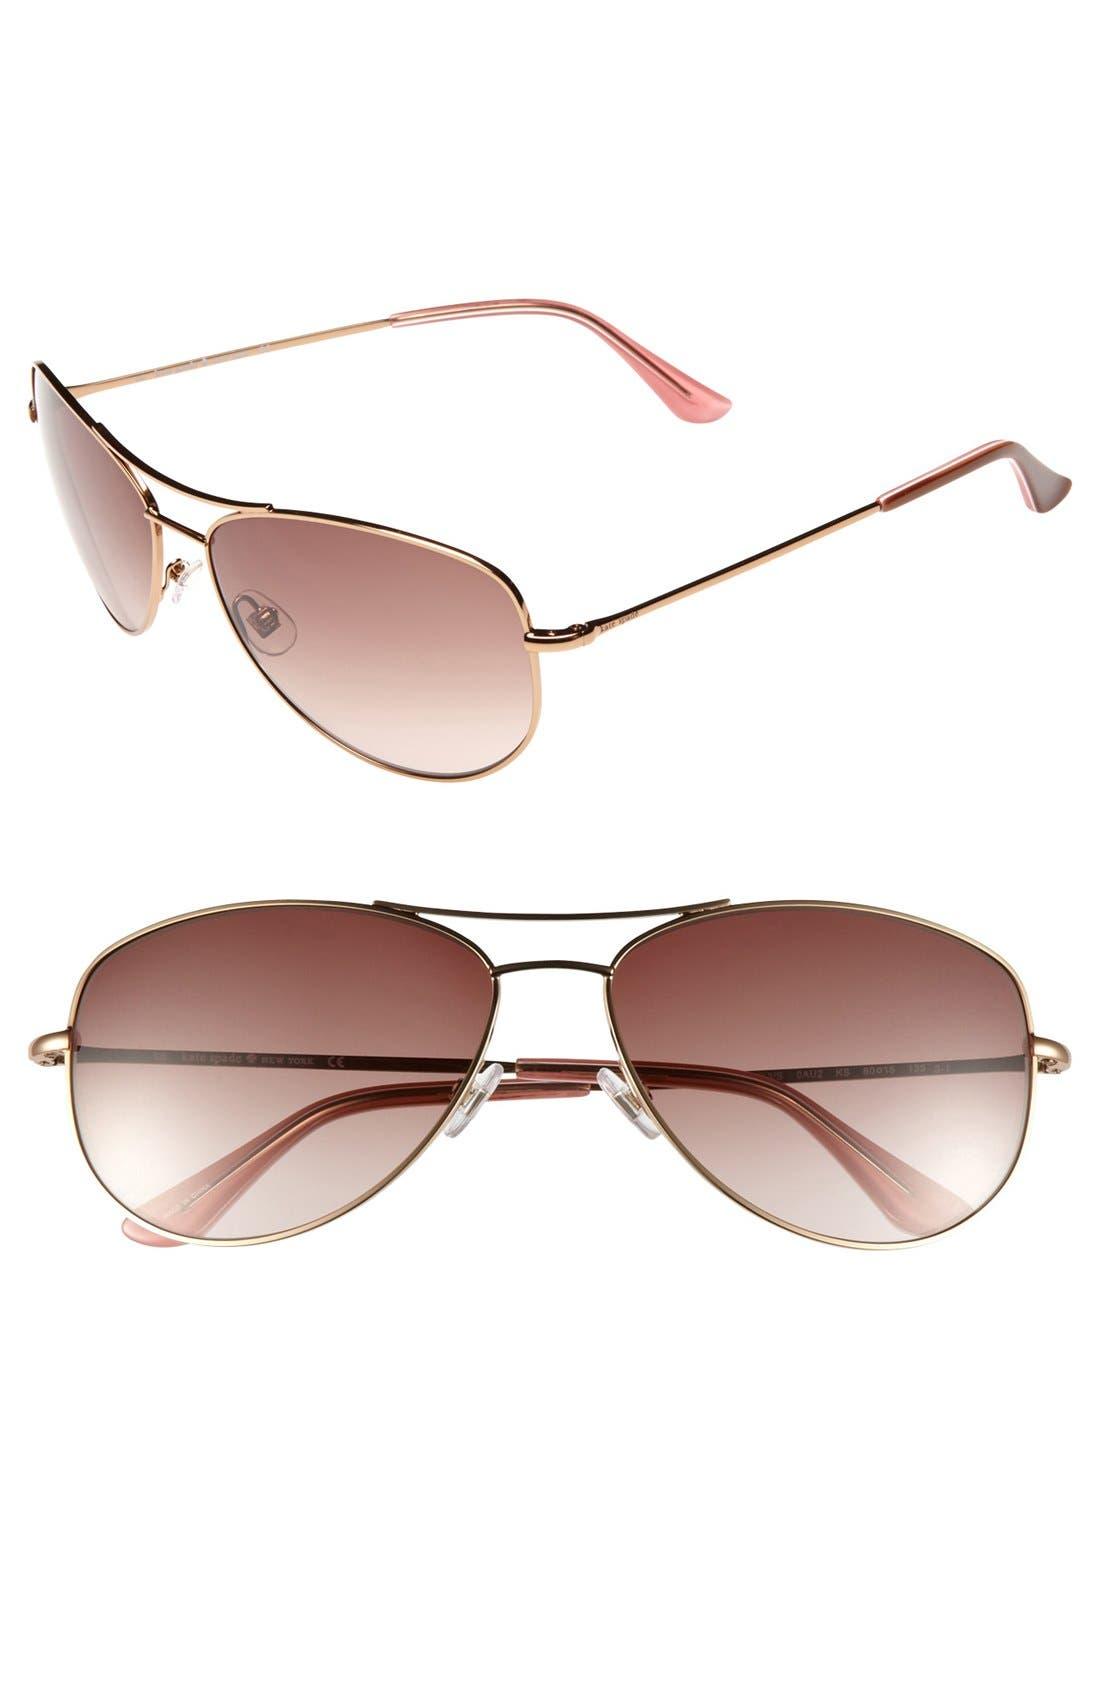 Main Image - kate spade new york 'ally 3' 60mm aviator sunglasses